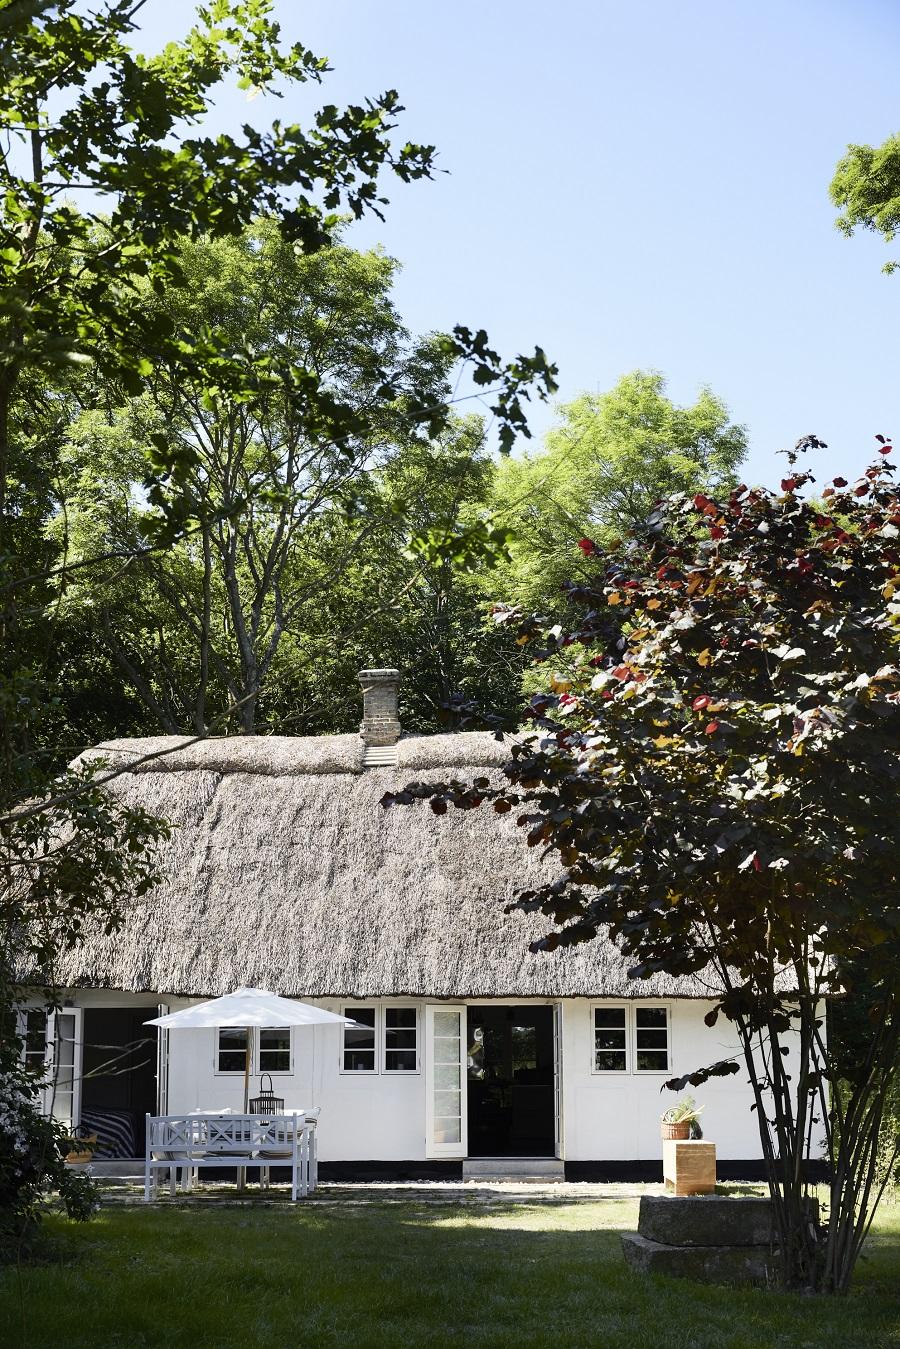 The Vipp Farmhouse - Traditional Meets Minimalism